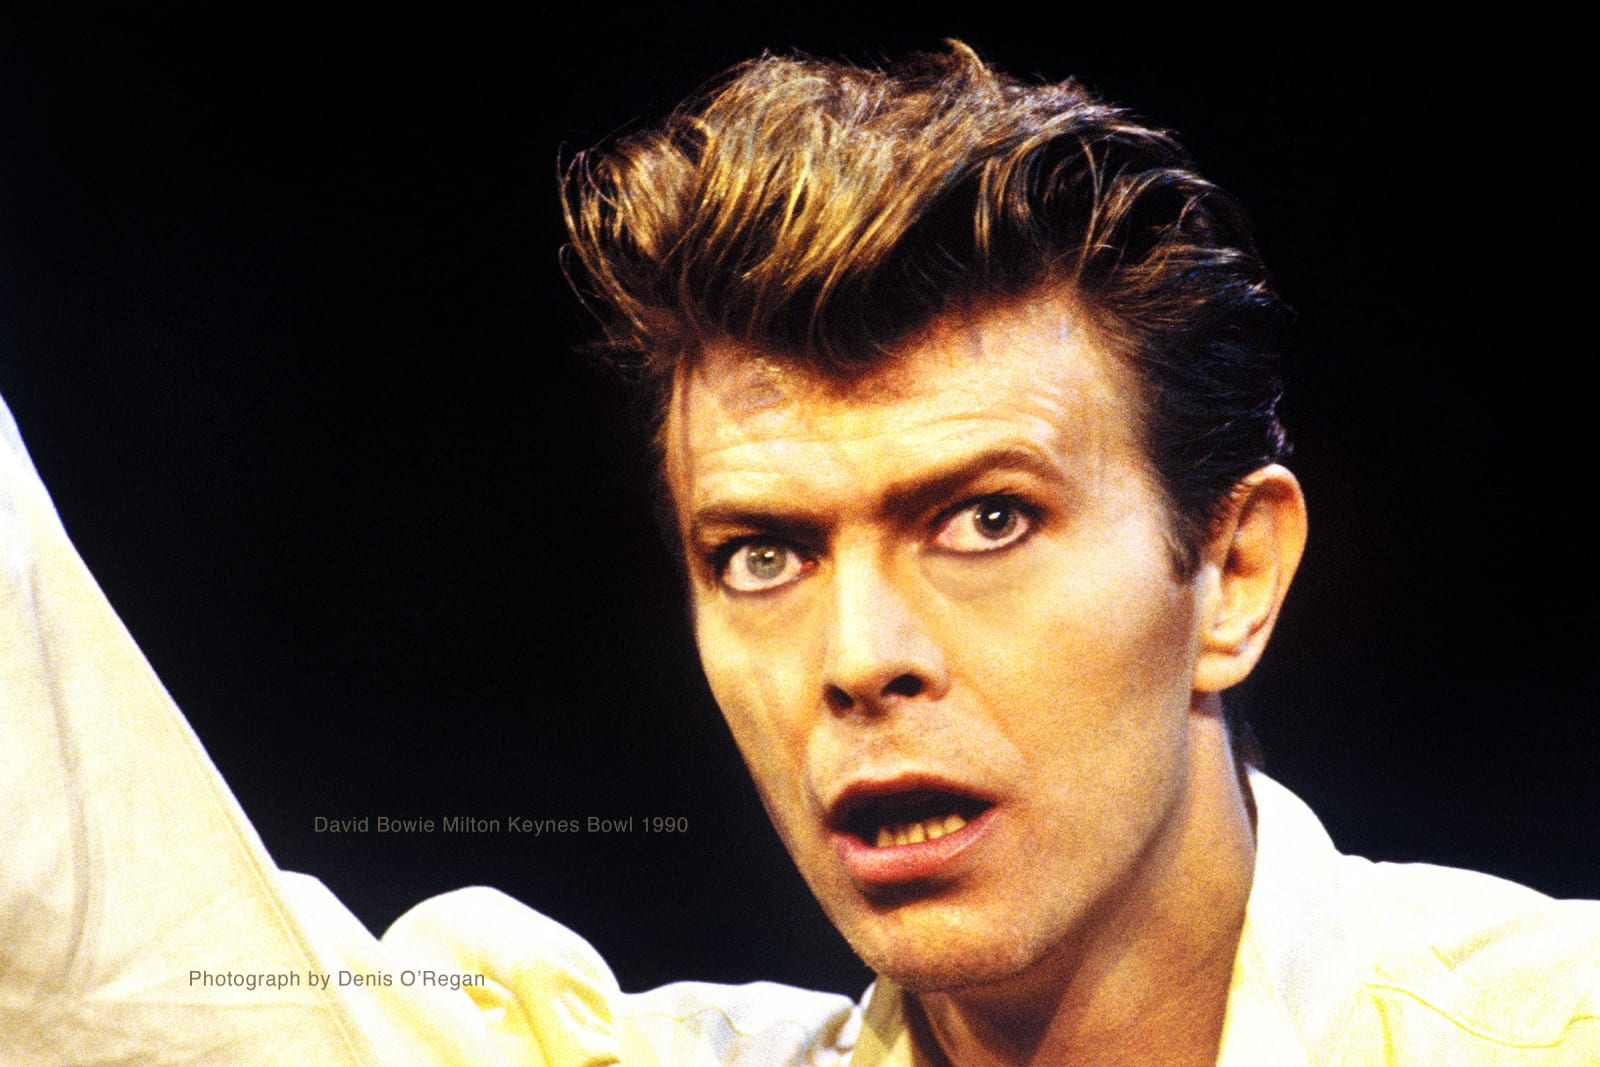 DAVID BOWIE, David Bowie Milton Keynes, 1990